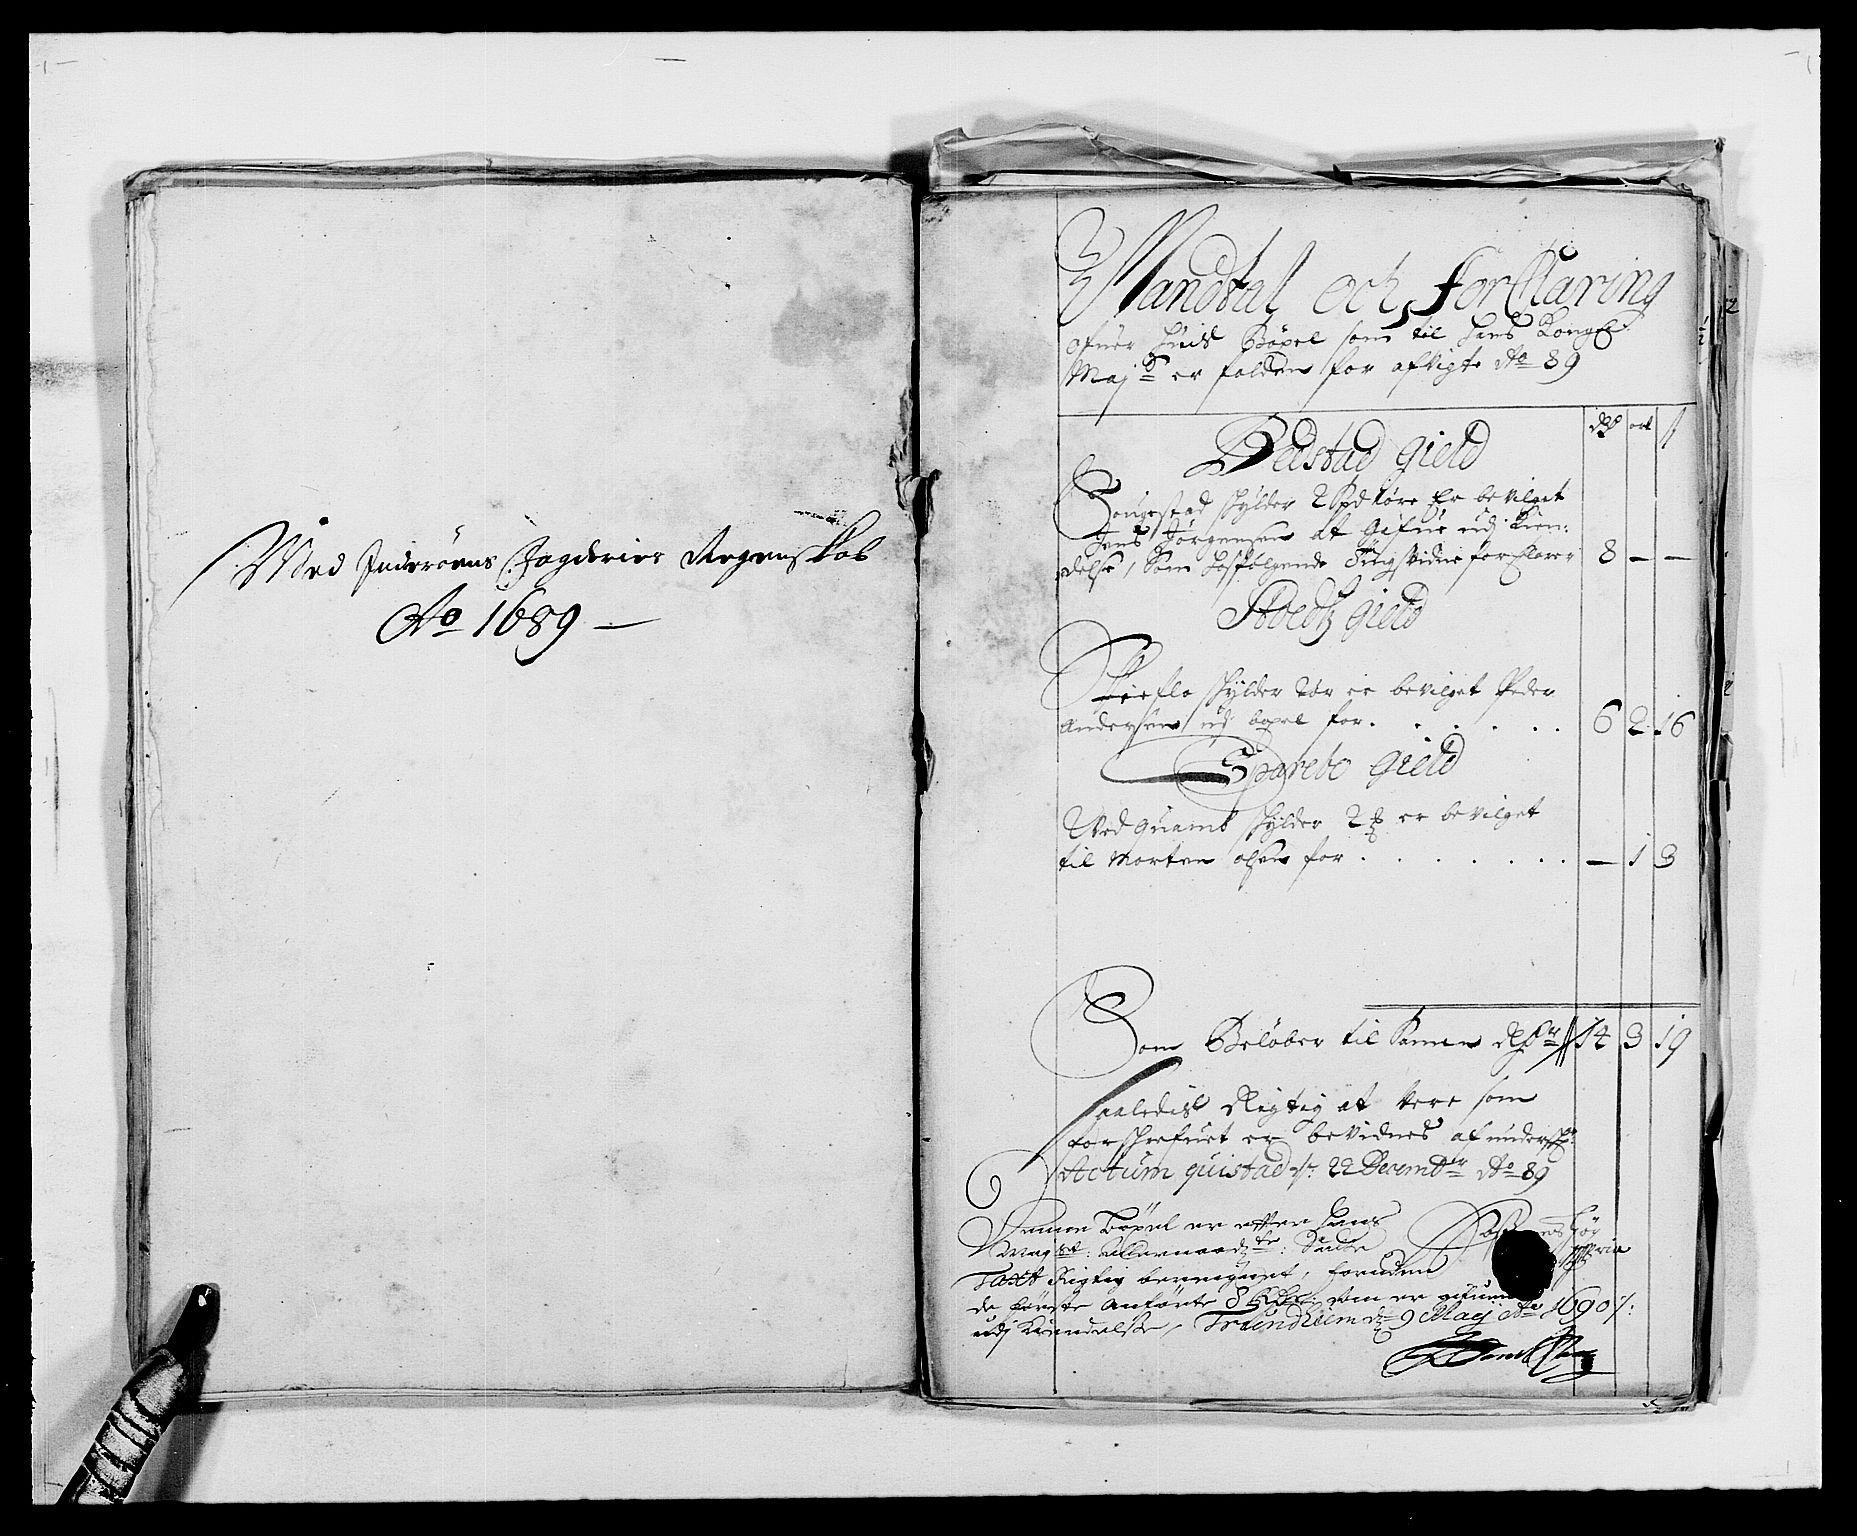 RA, Rentekammeret inntil 1814, Reviderte regnskaper, Fogderegnskap, R63/L4306: Fogderegnskap Inderøy, 1687-1689, s. 475